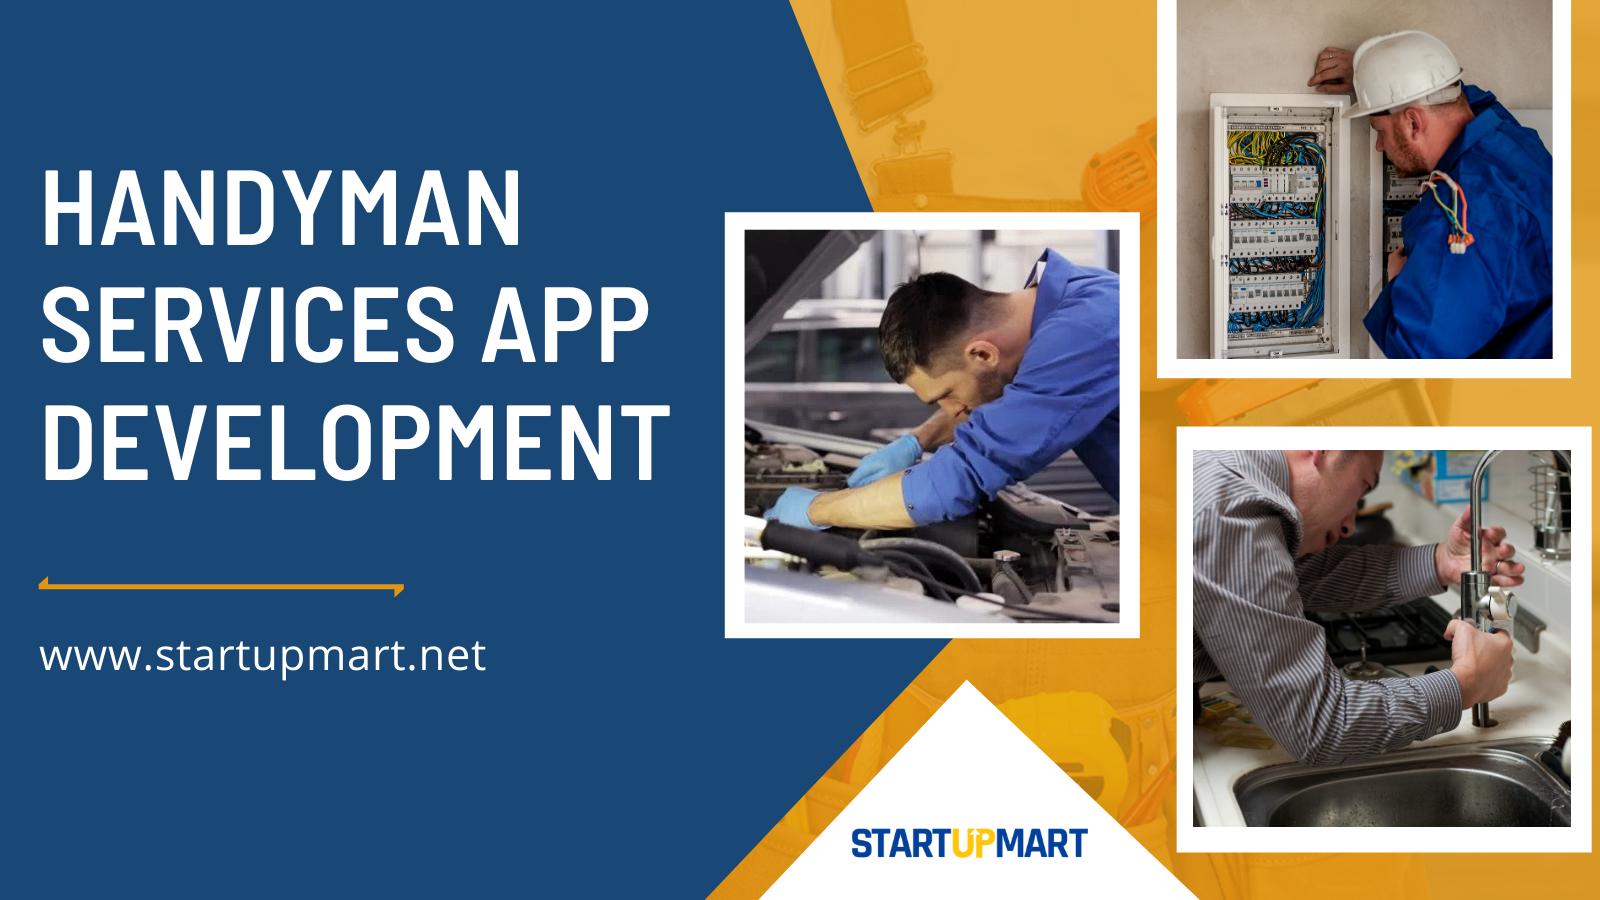 Handyman Services App Development